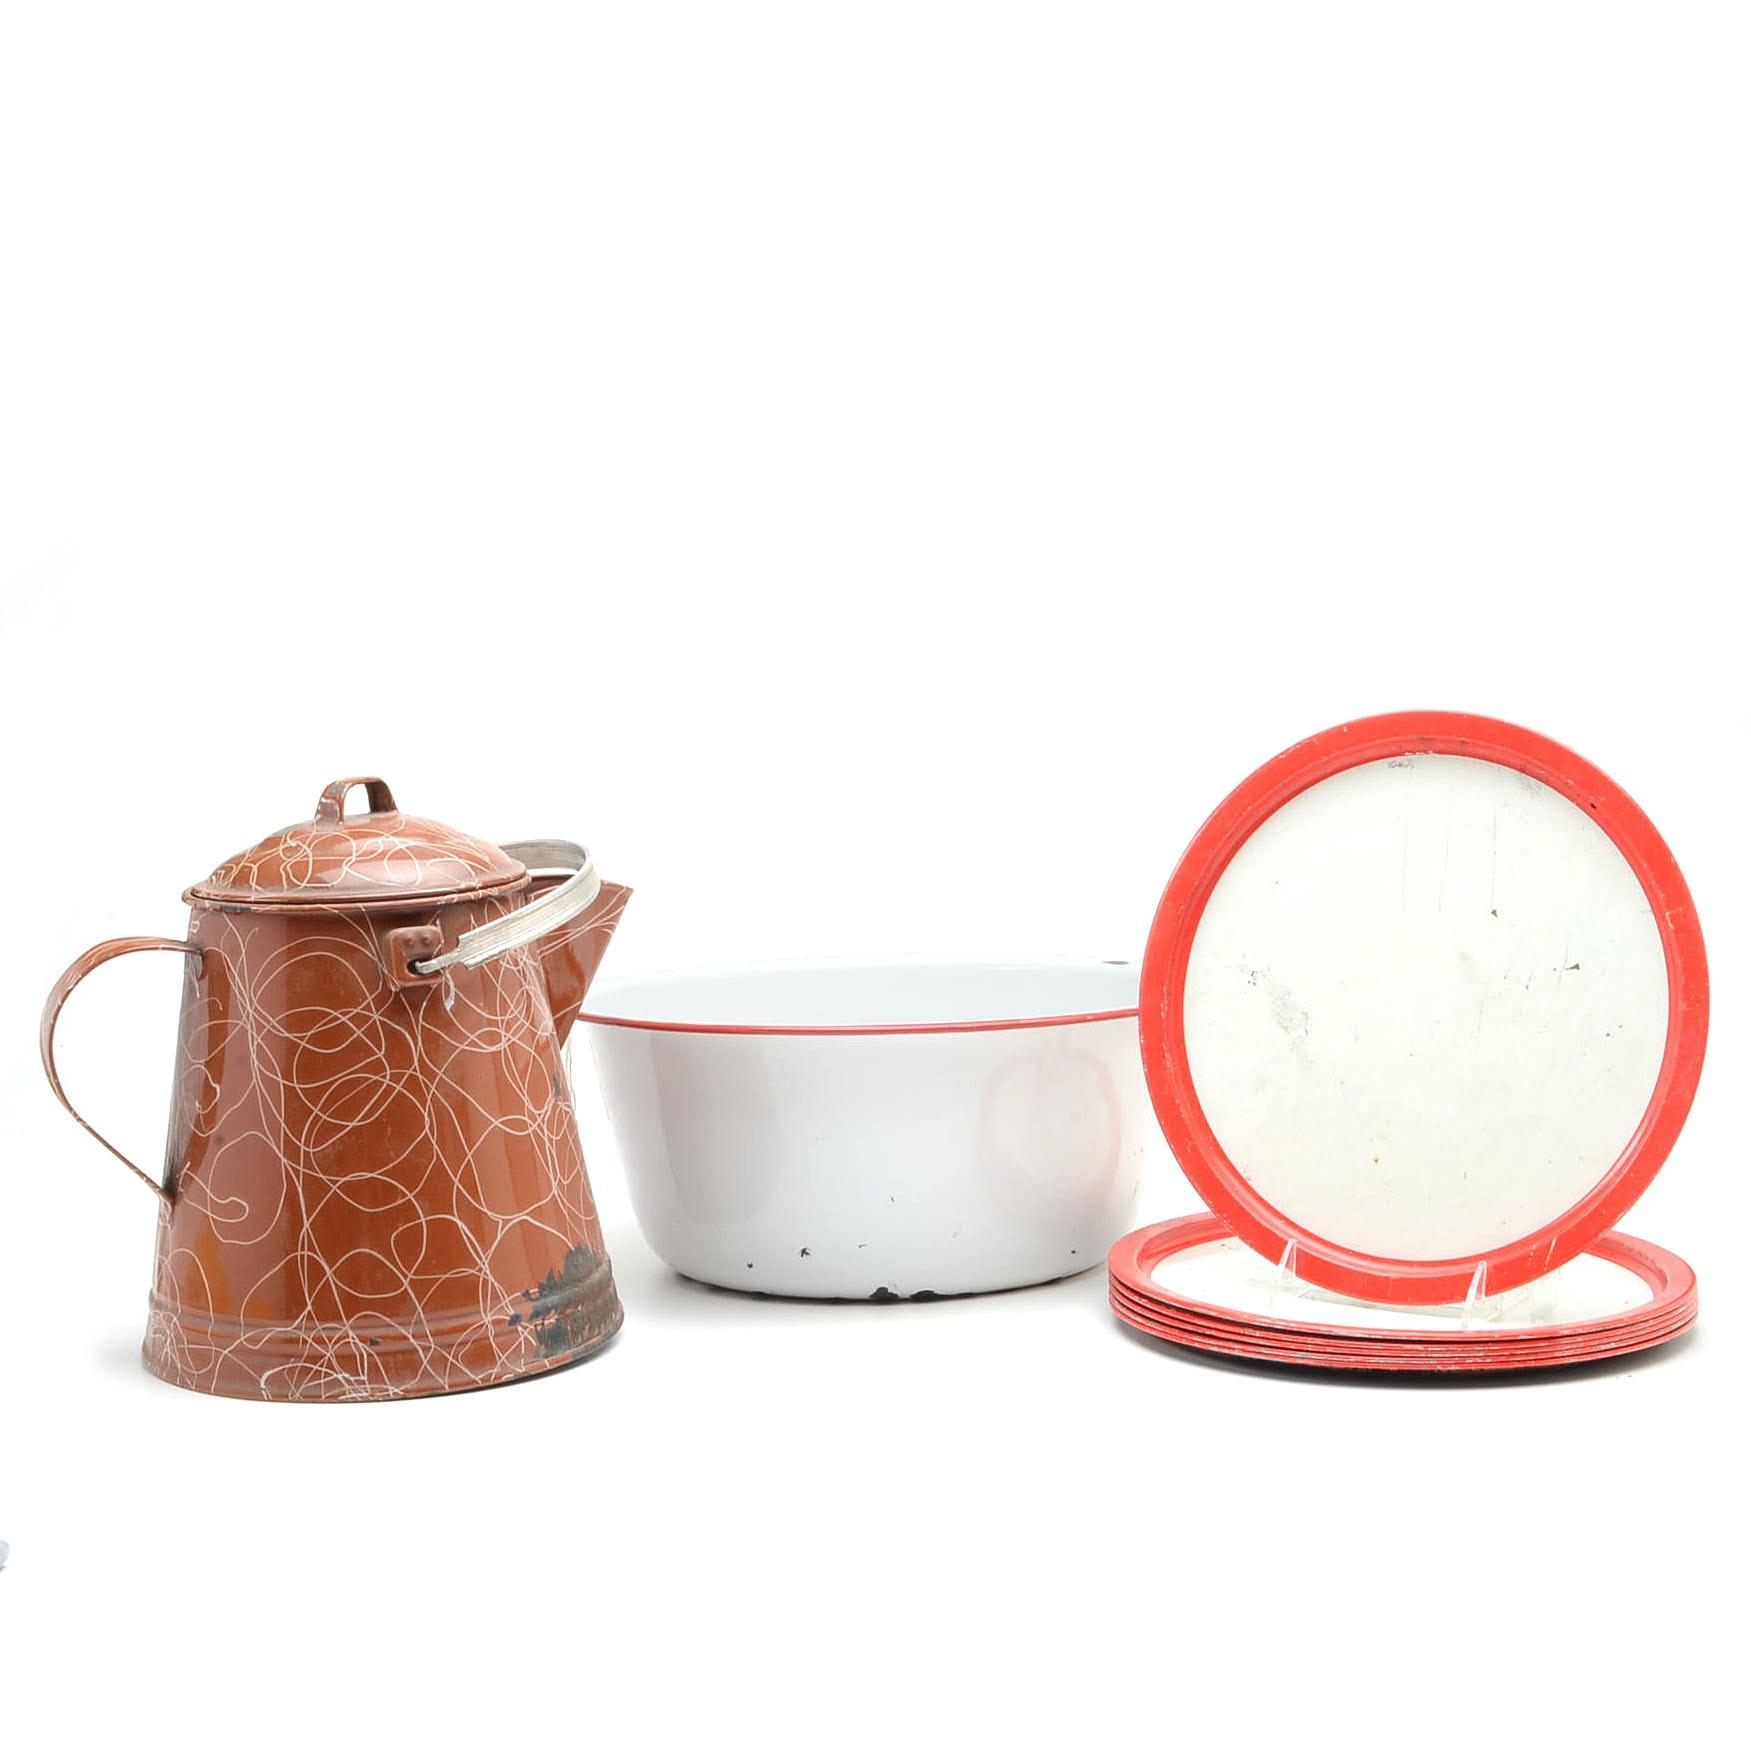 Vintage Enamel Bowl, Plates and Kettle